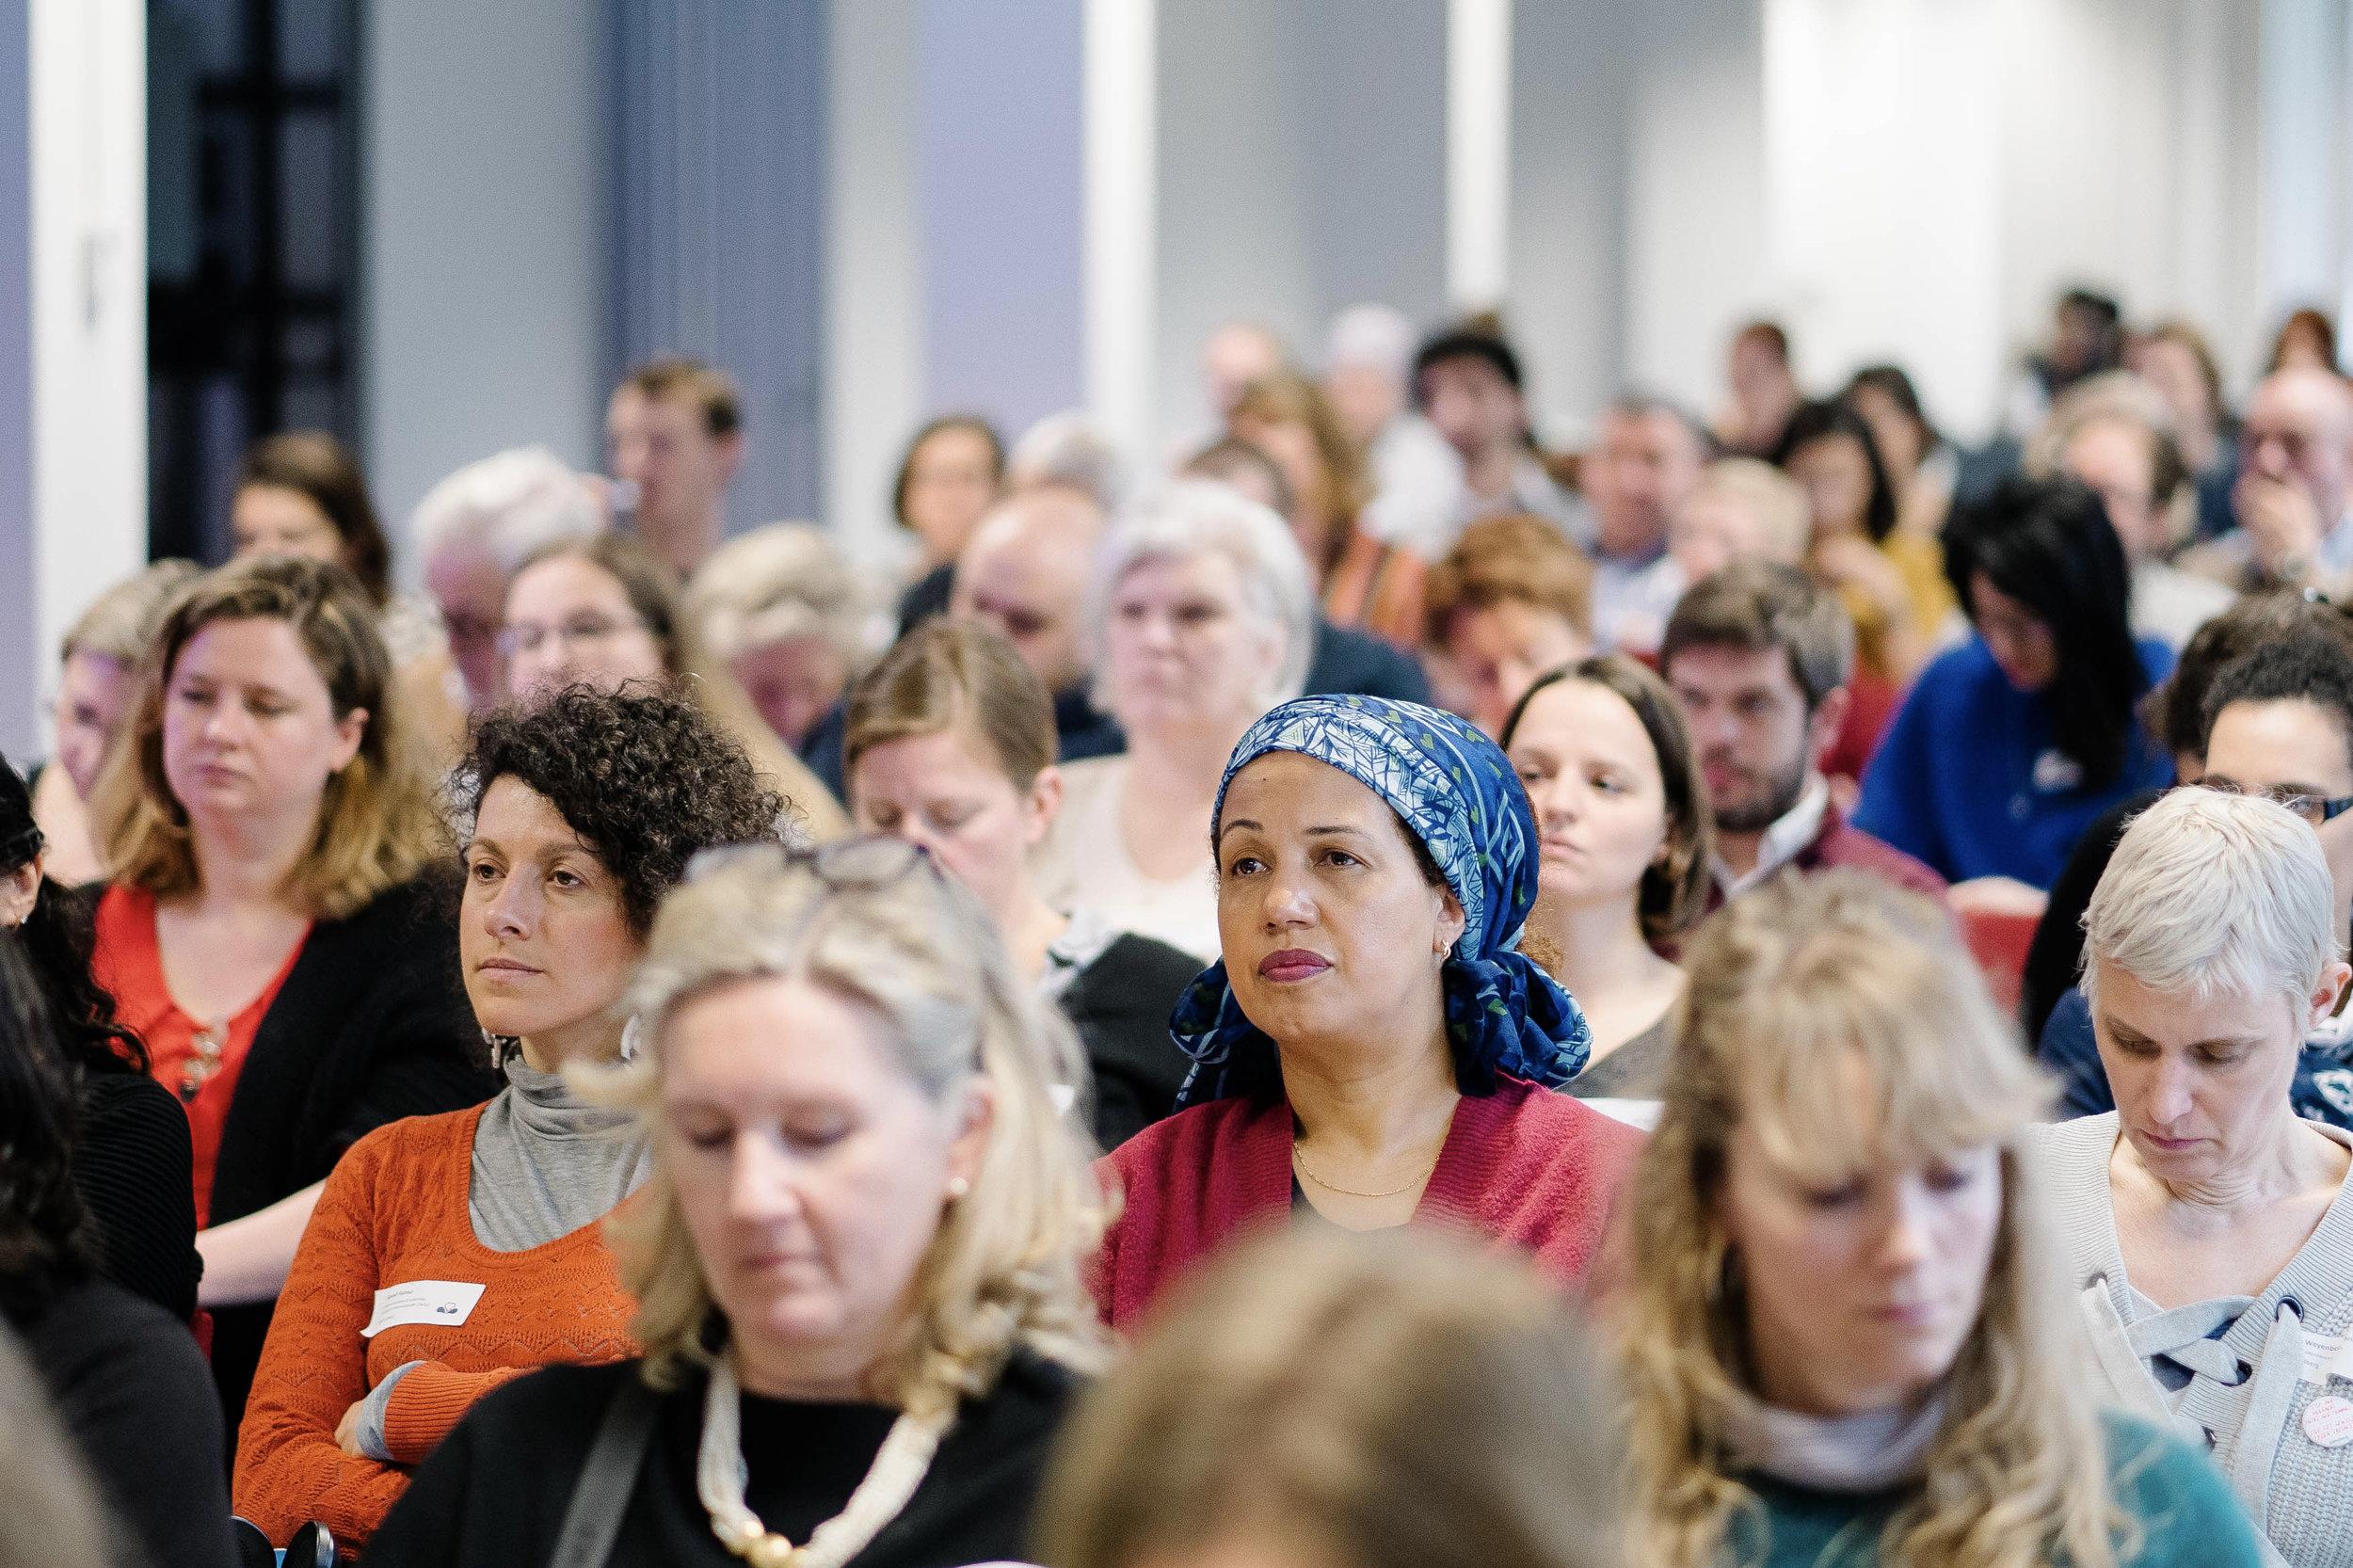 photographe-conference-bruxelles-corporate-20.jpg